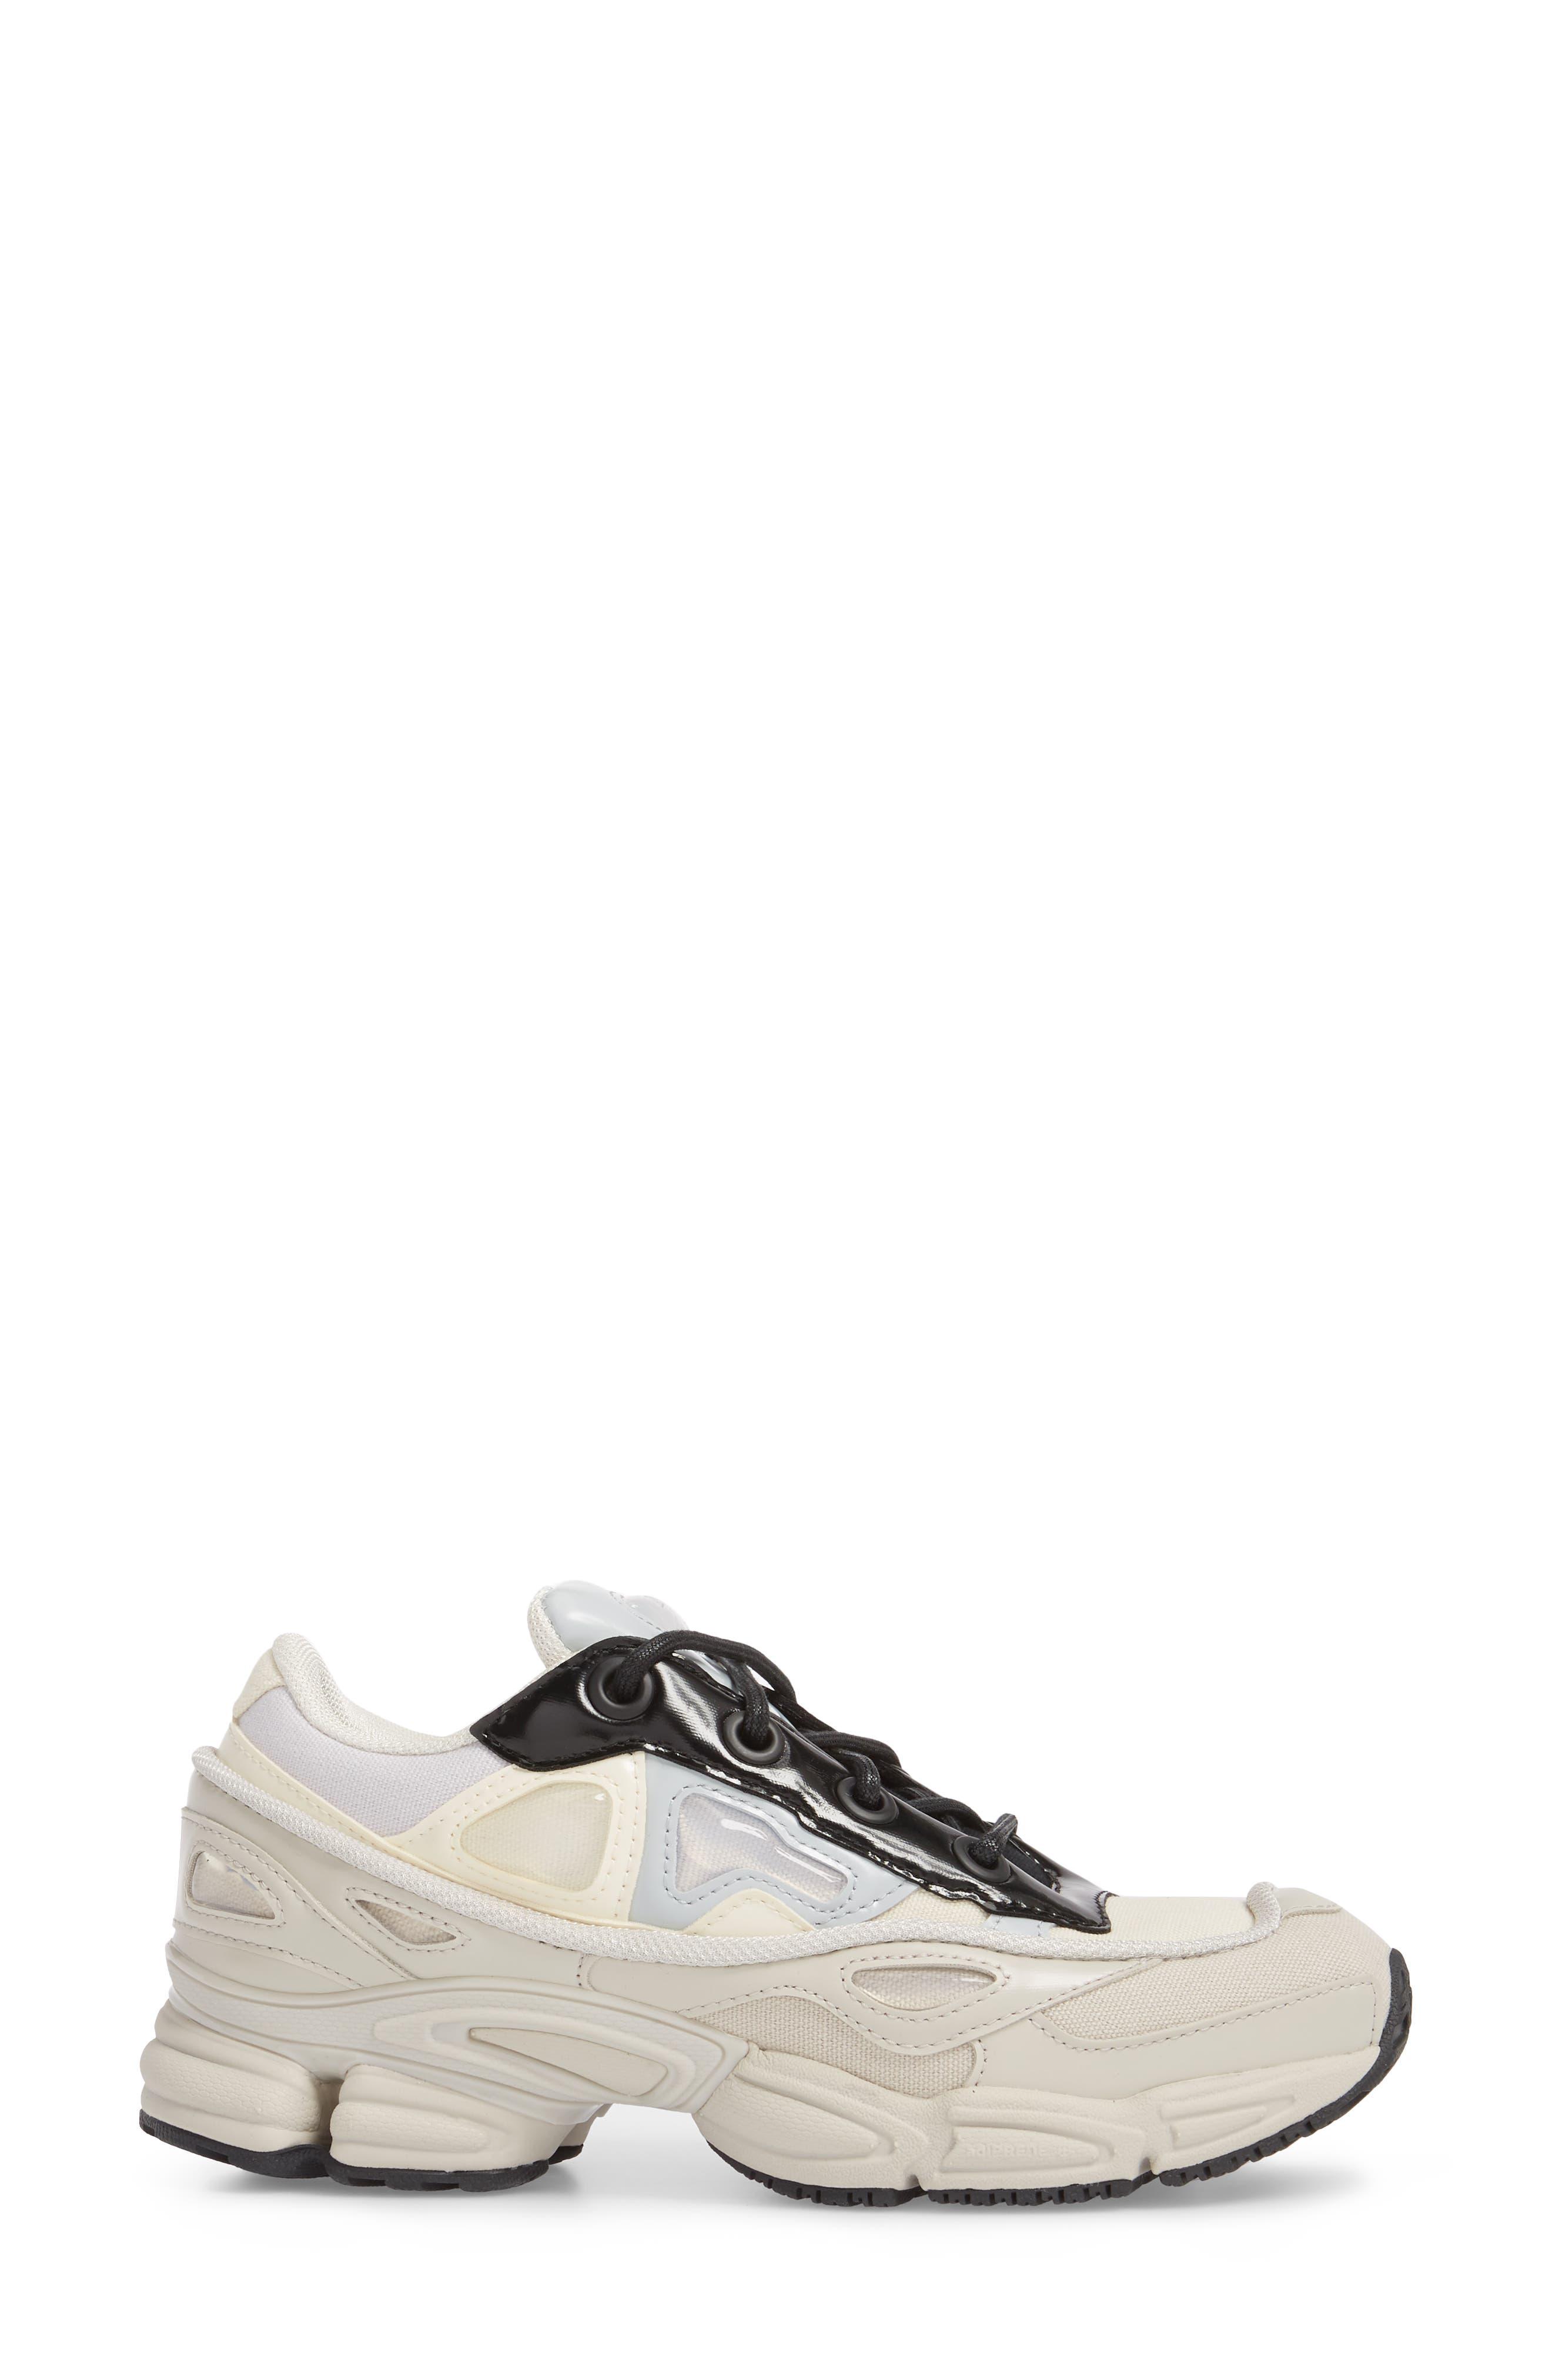 adidas by Raf Simons Ozweego III Sneaker,                             Alternate thumbnail 3, color,                             150